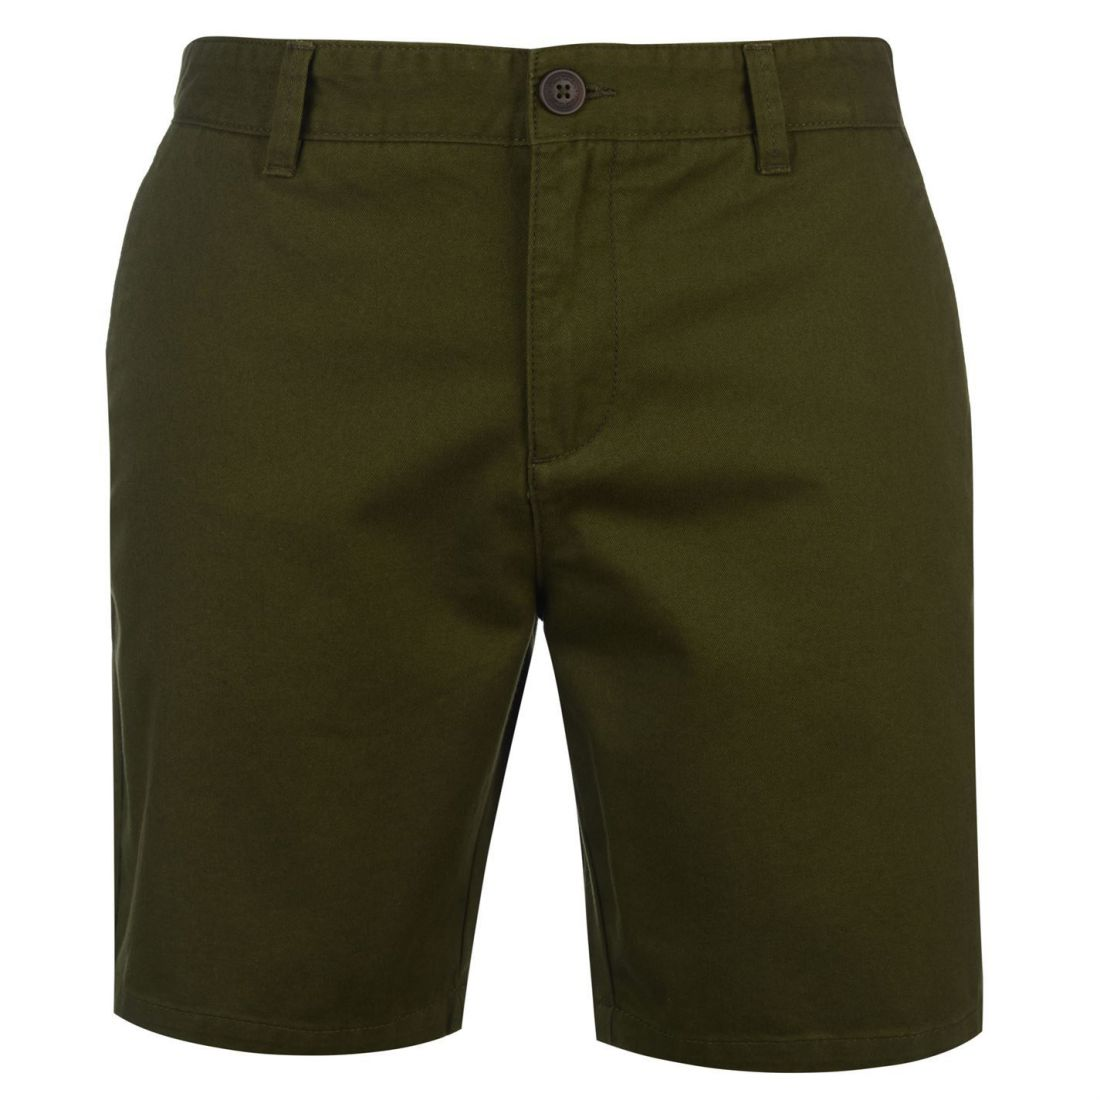 vast selection sale huge selection of Pierre Cardin Chino Shorts Herren Herren Chino Hose Pants Unterhose  Baumwolle   eBay